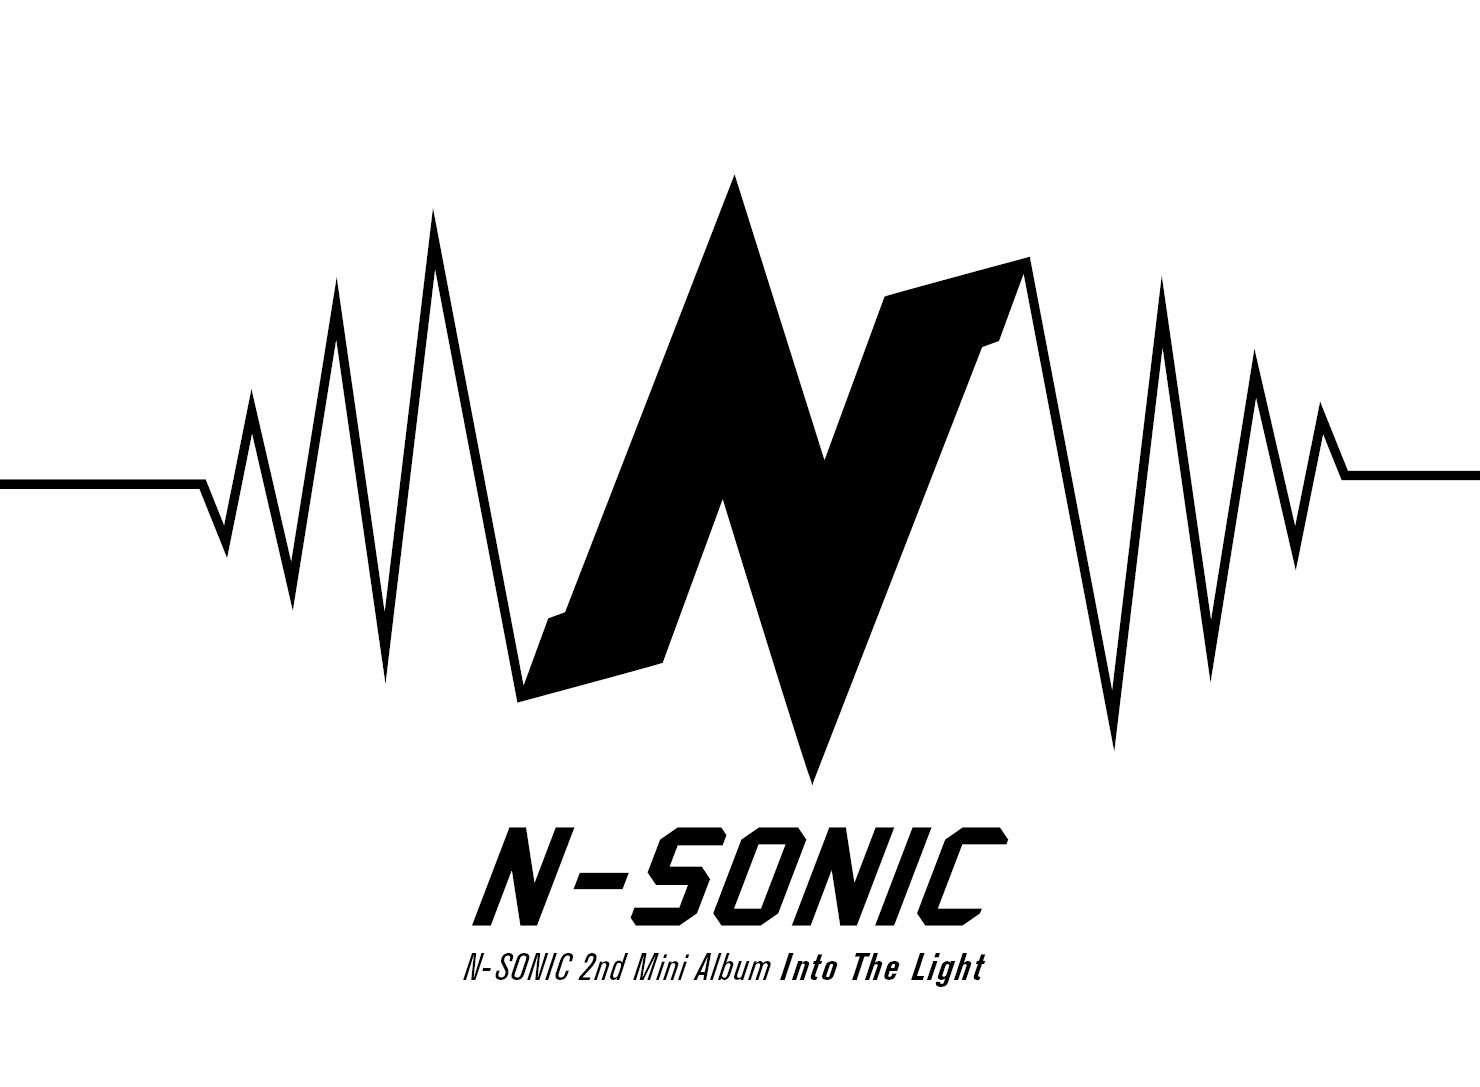 [Mini Album] N-SONIC - Into The Light [2nd Mini Album]